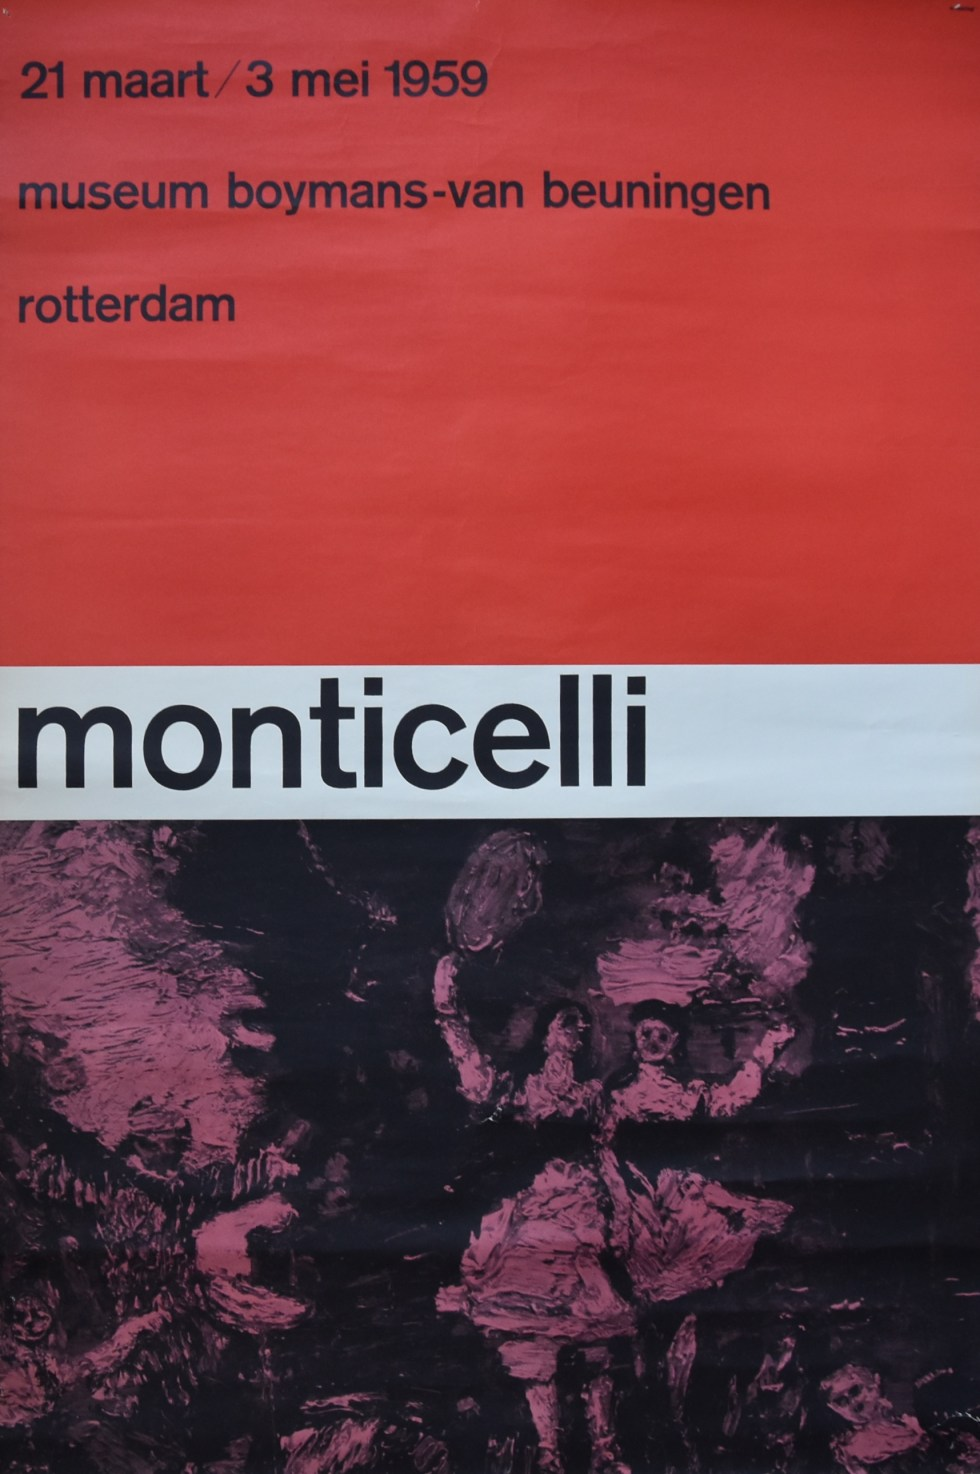 MONTICELLI aa